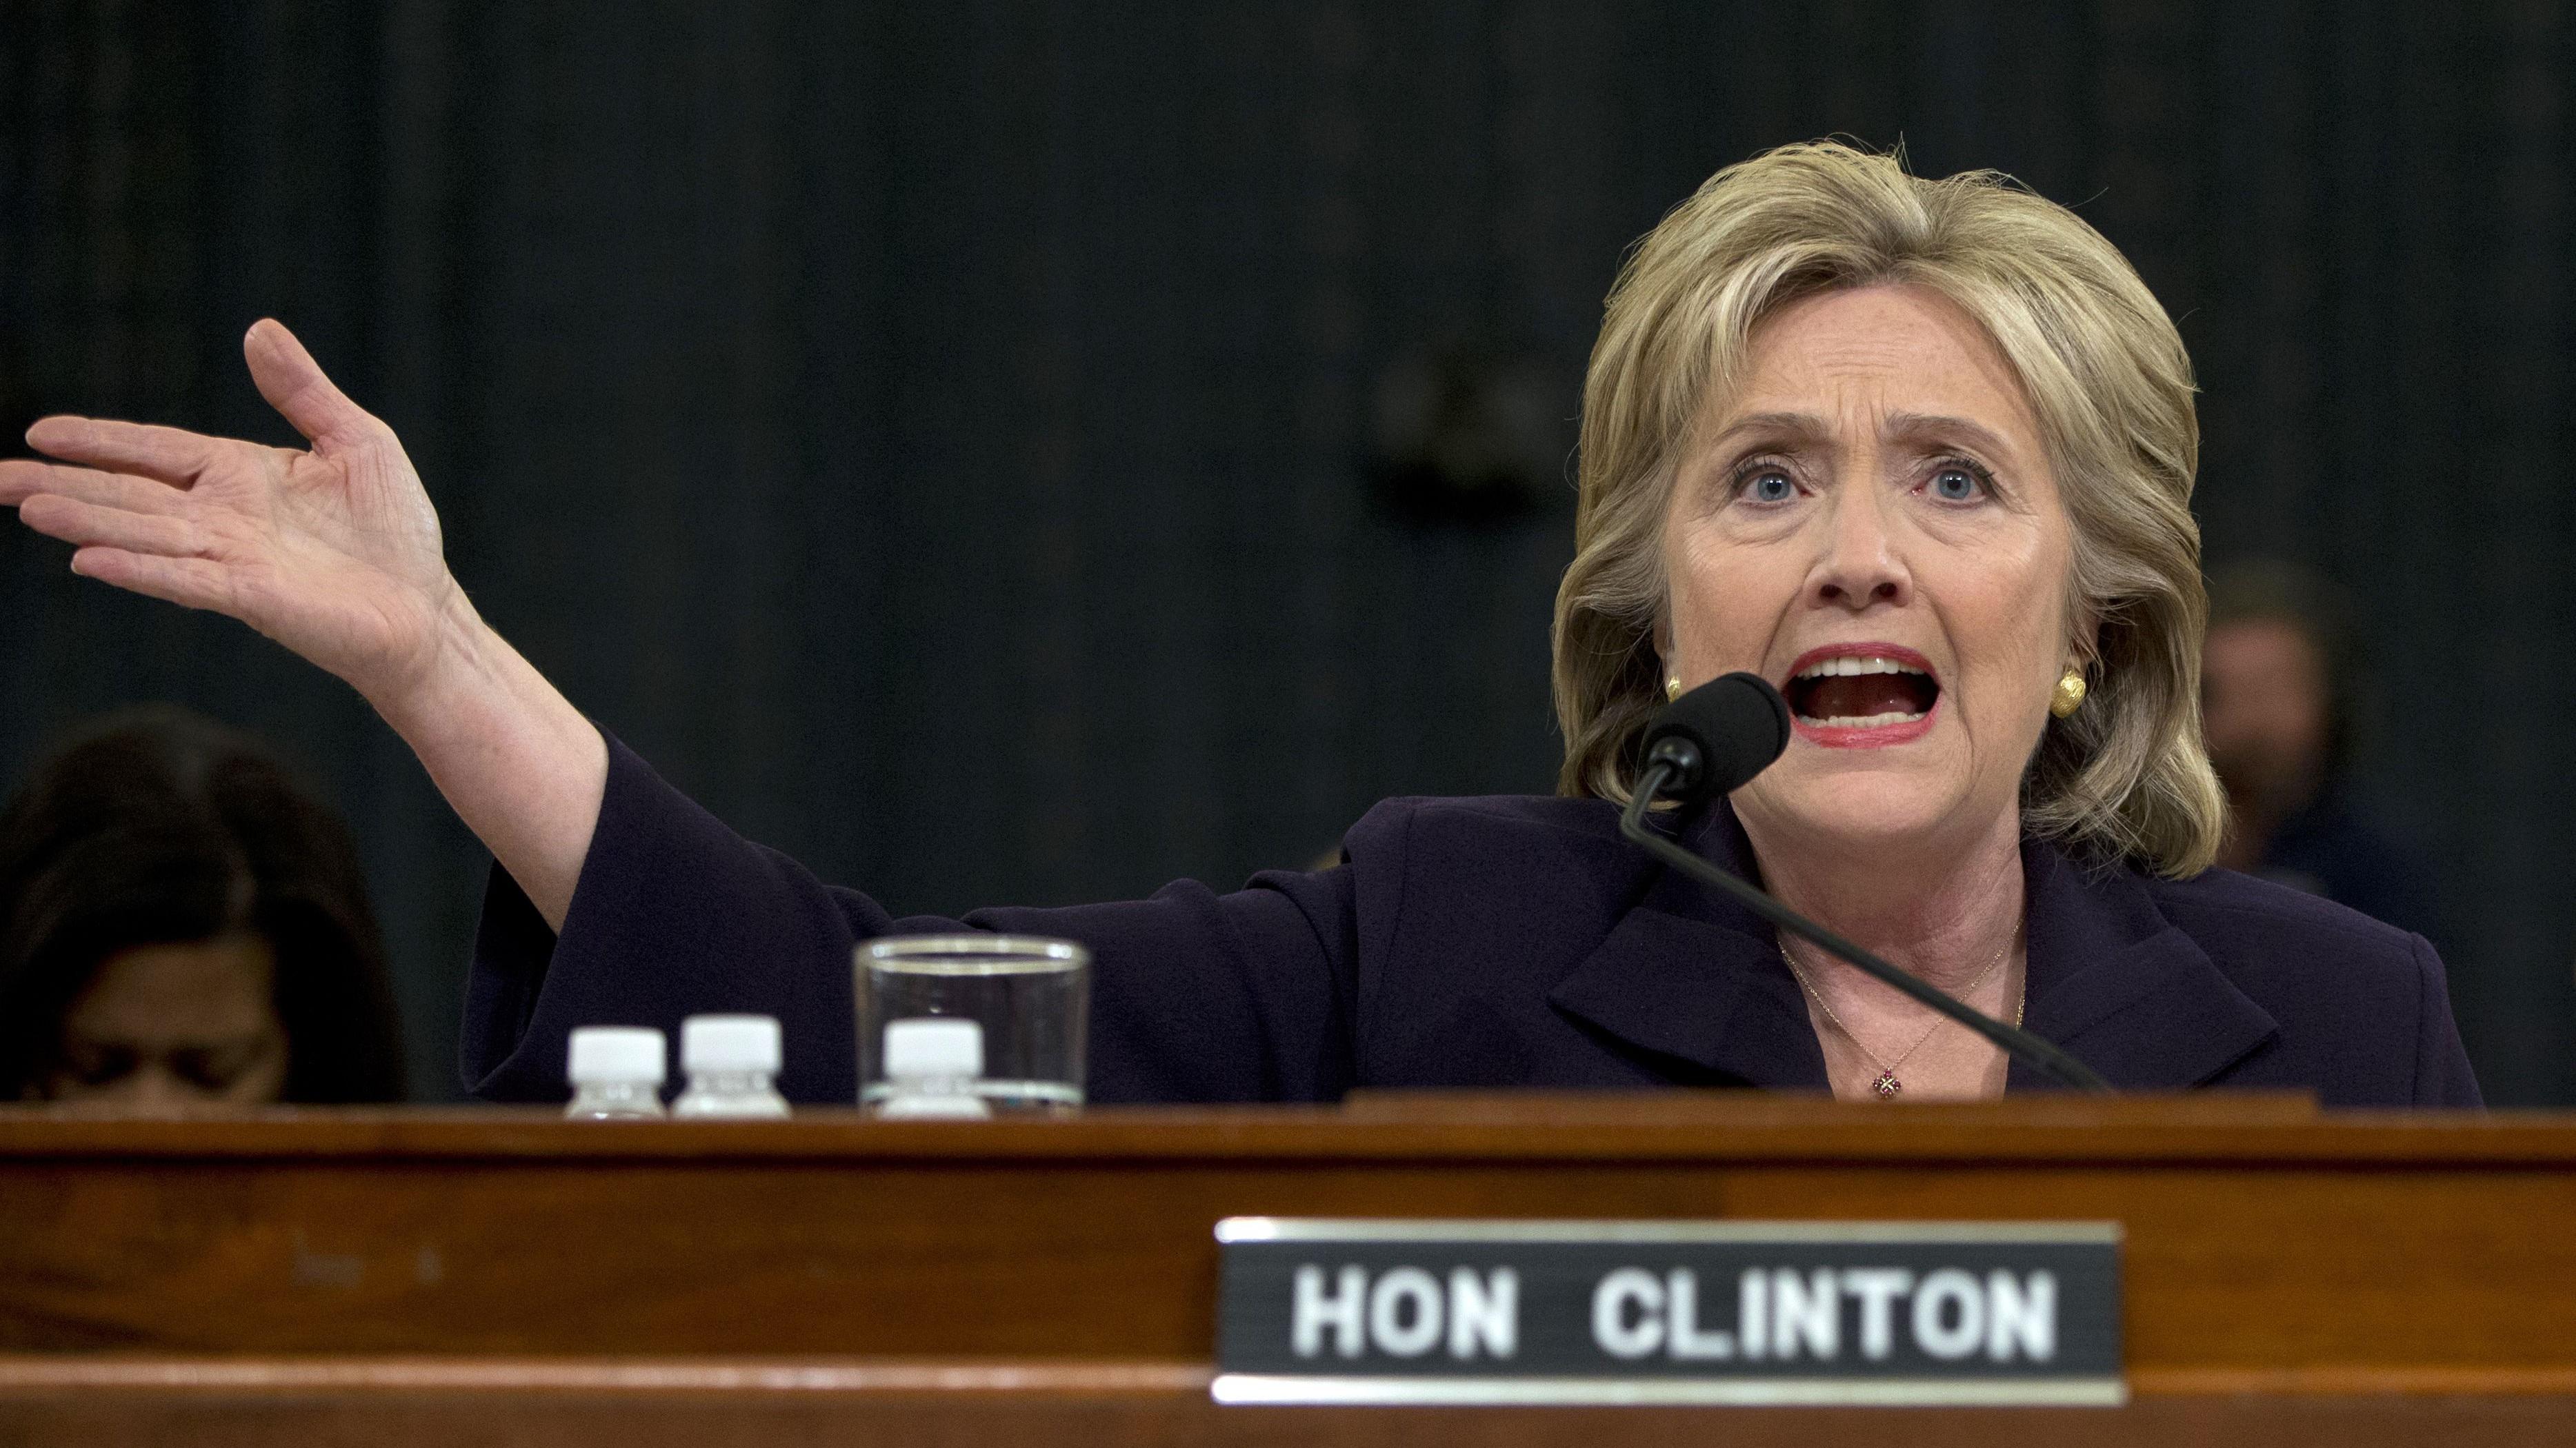 Hillary Rodham Clinton testifies on Capitol Hill in Washington, Thursday, Oct. 22, 2015